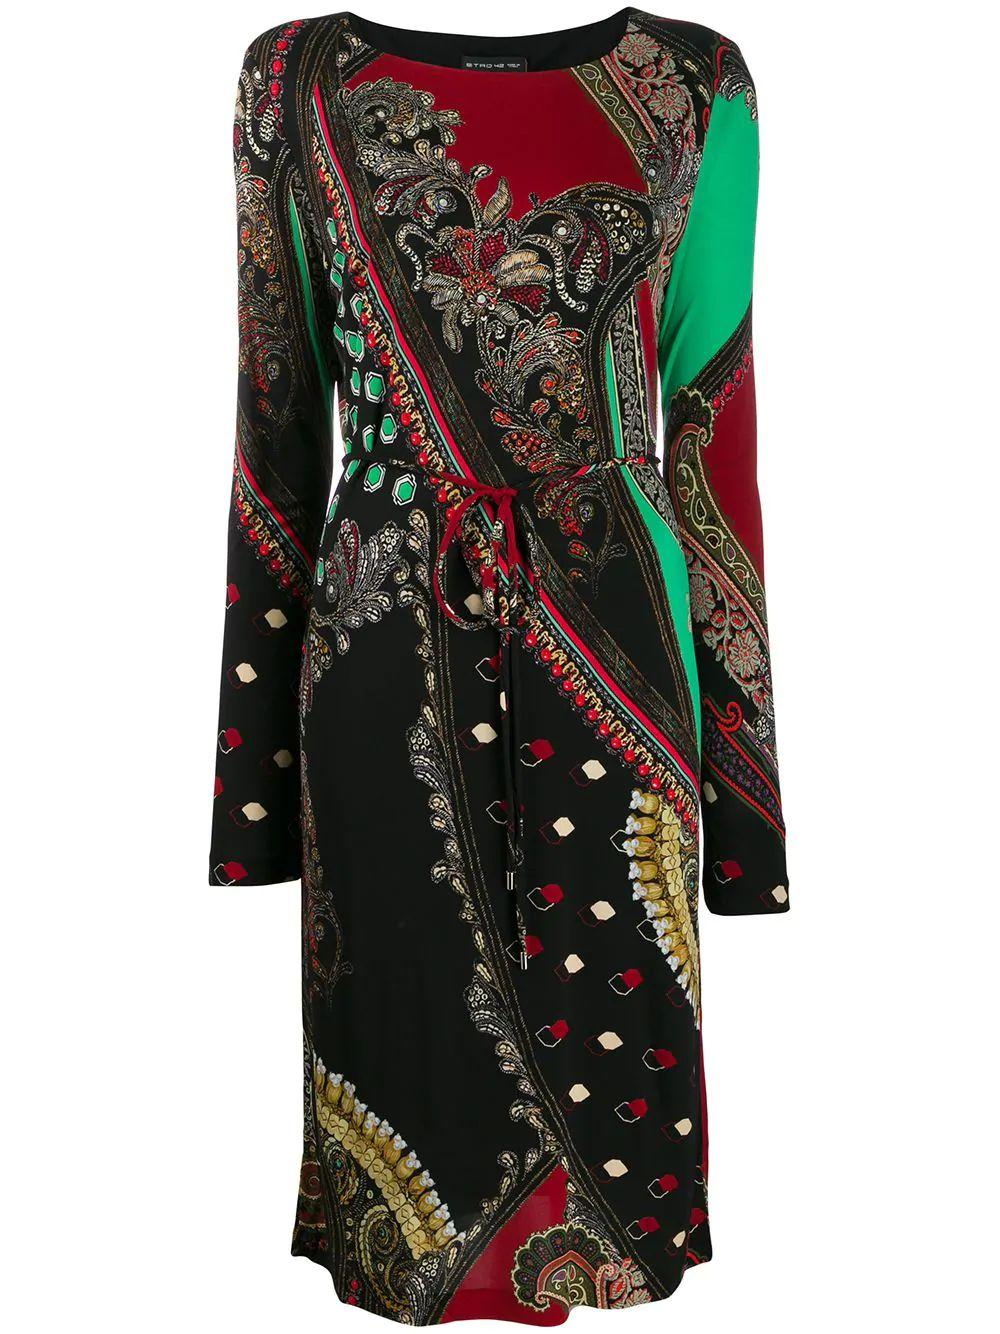 Long Sleeve Jersey Print Dress With Tie Belt